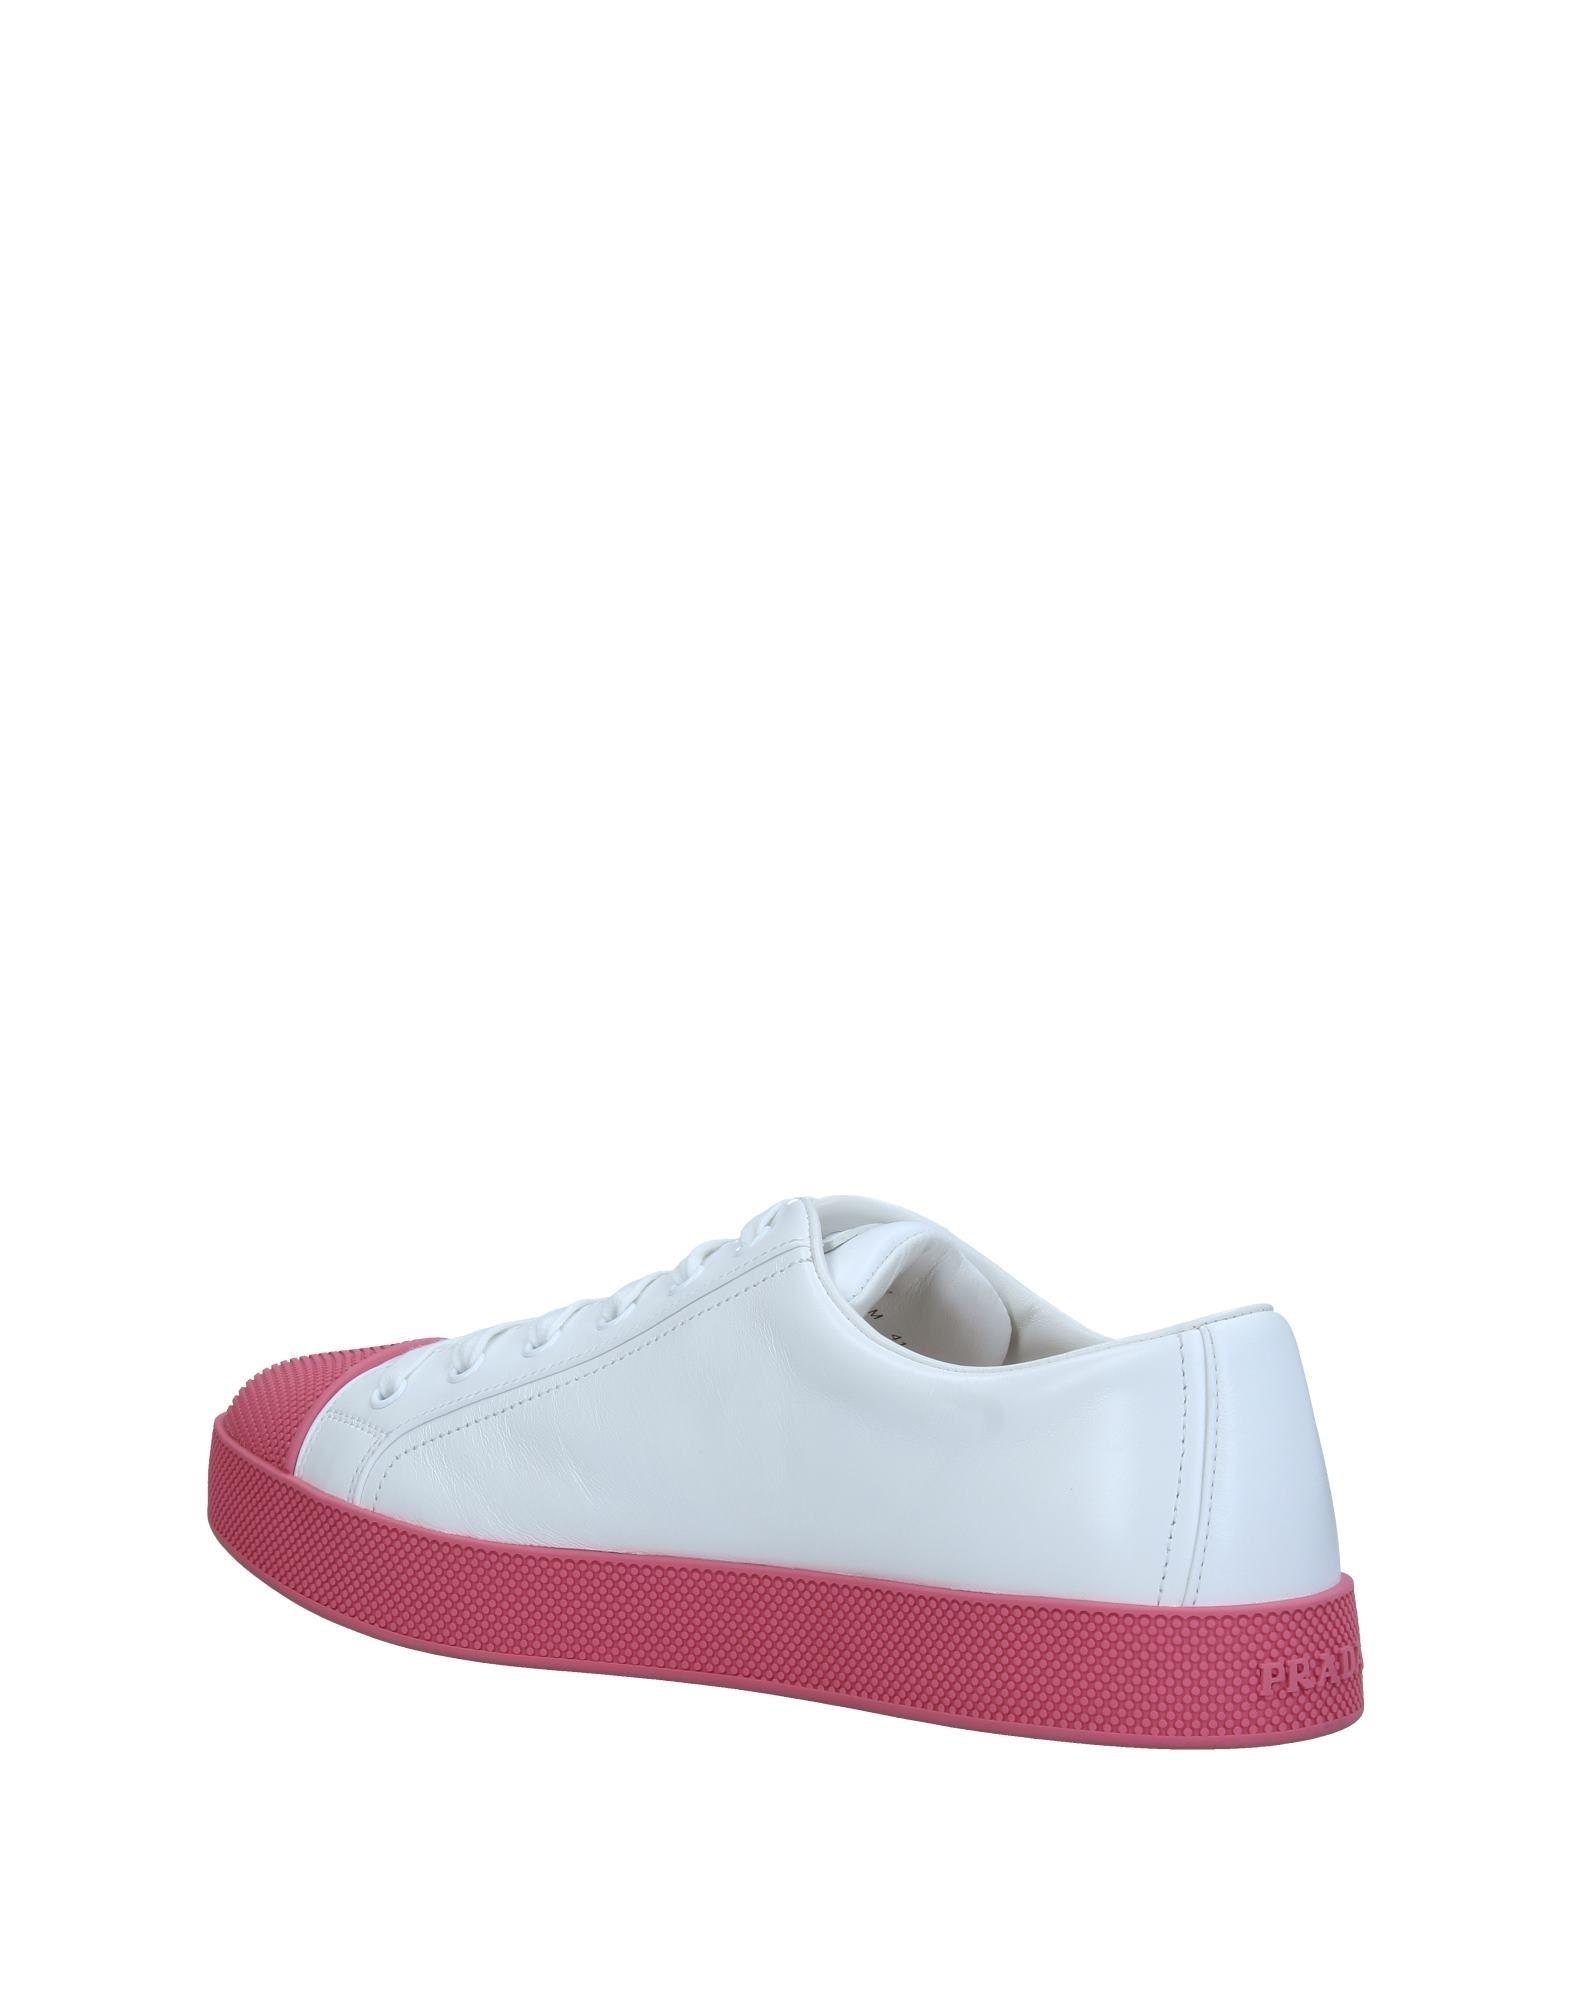 Prada Sport Sneakers Damen  11363134PJGut aussehende strapazierfähige Schuhe